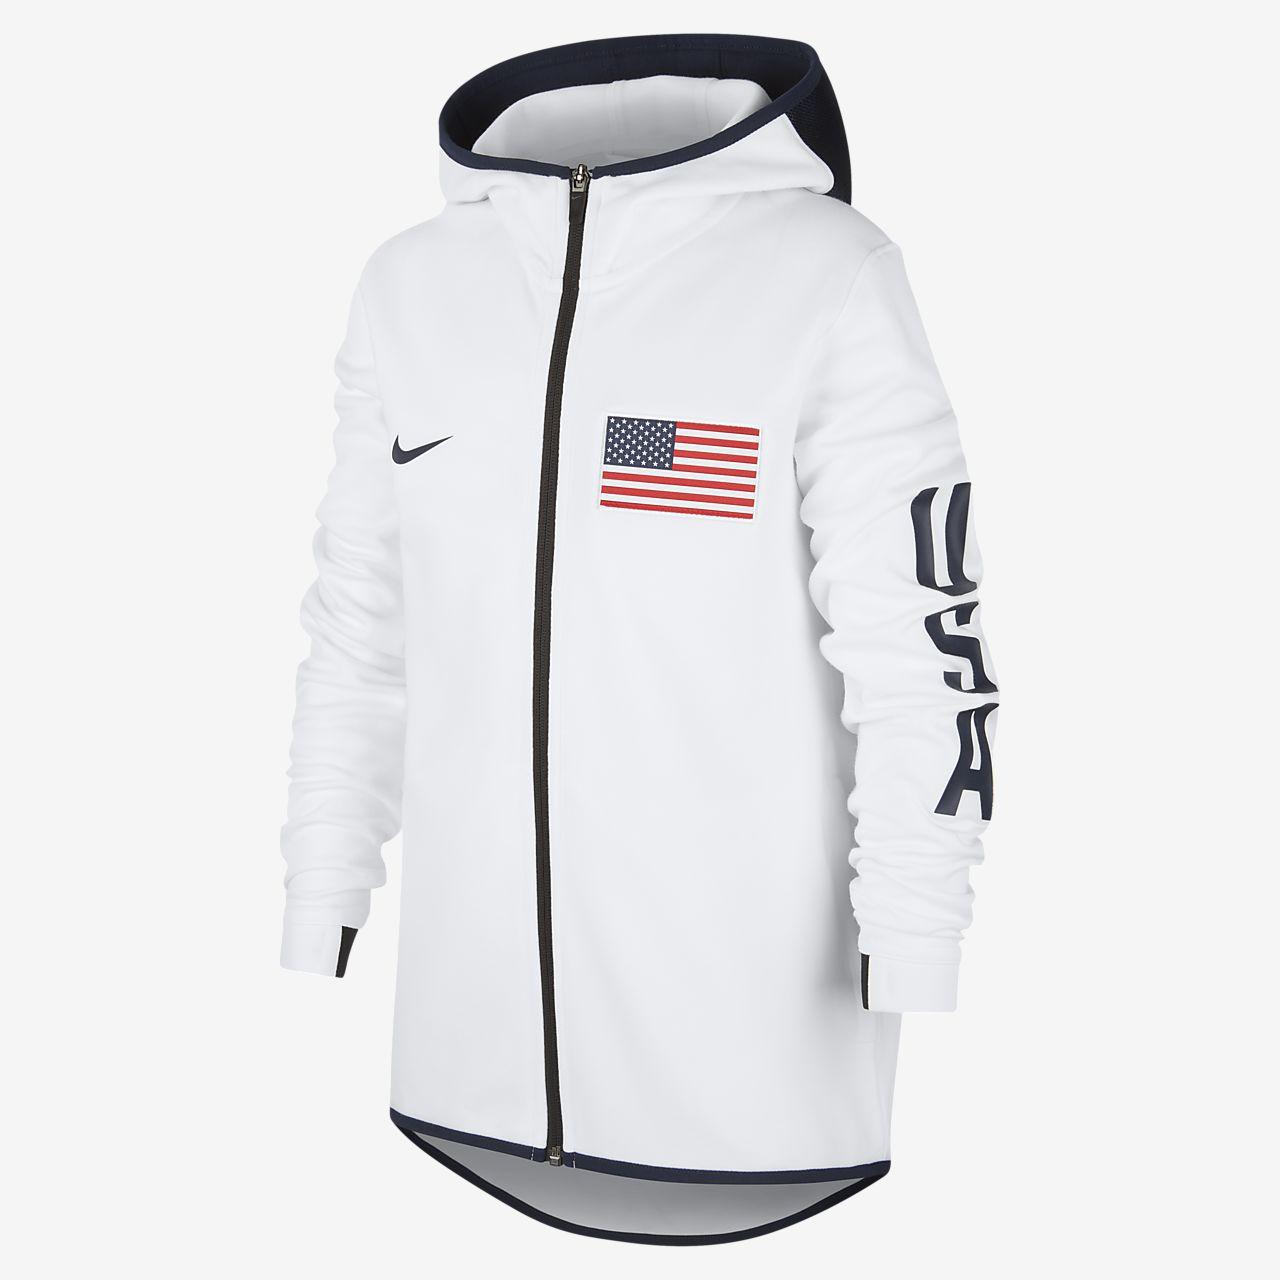 USA Nike Showtime Kids' Basketball Hoodie